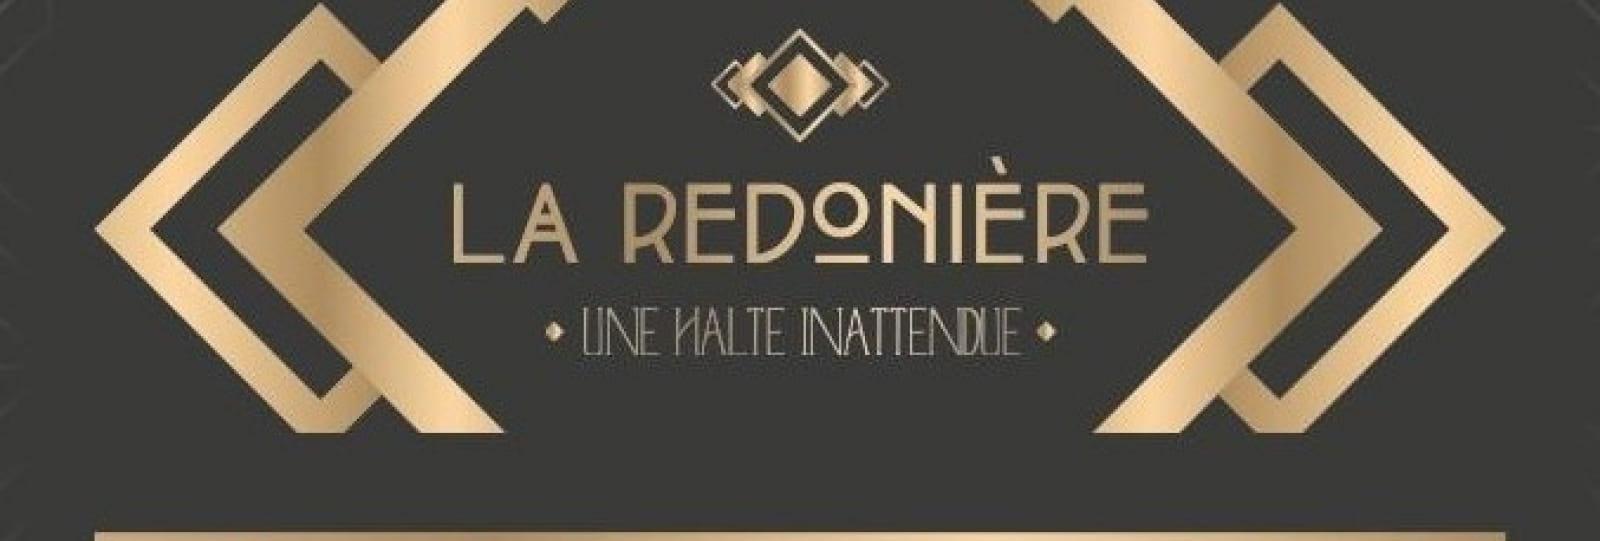 La Redonière